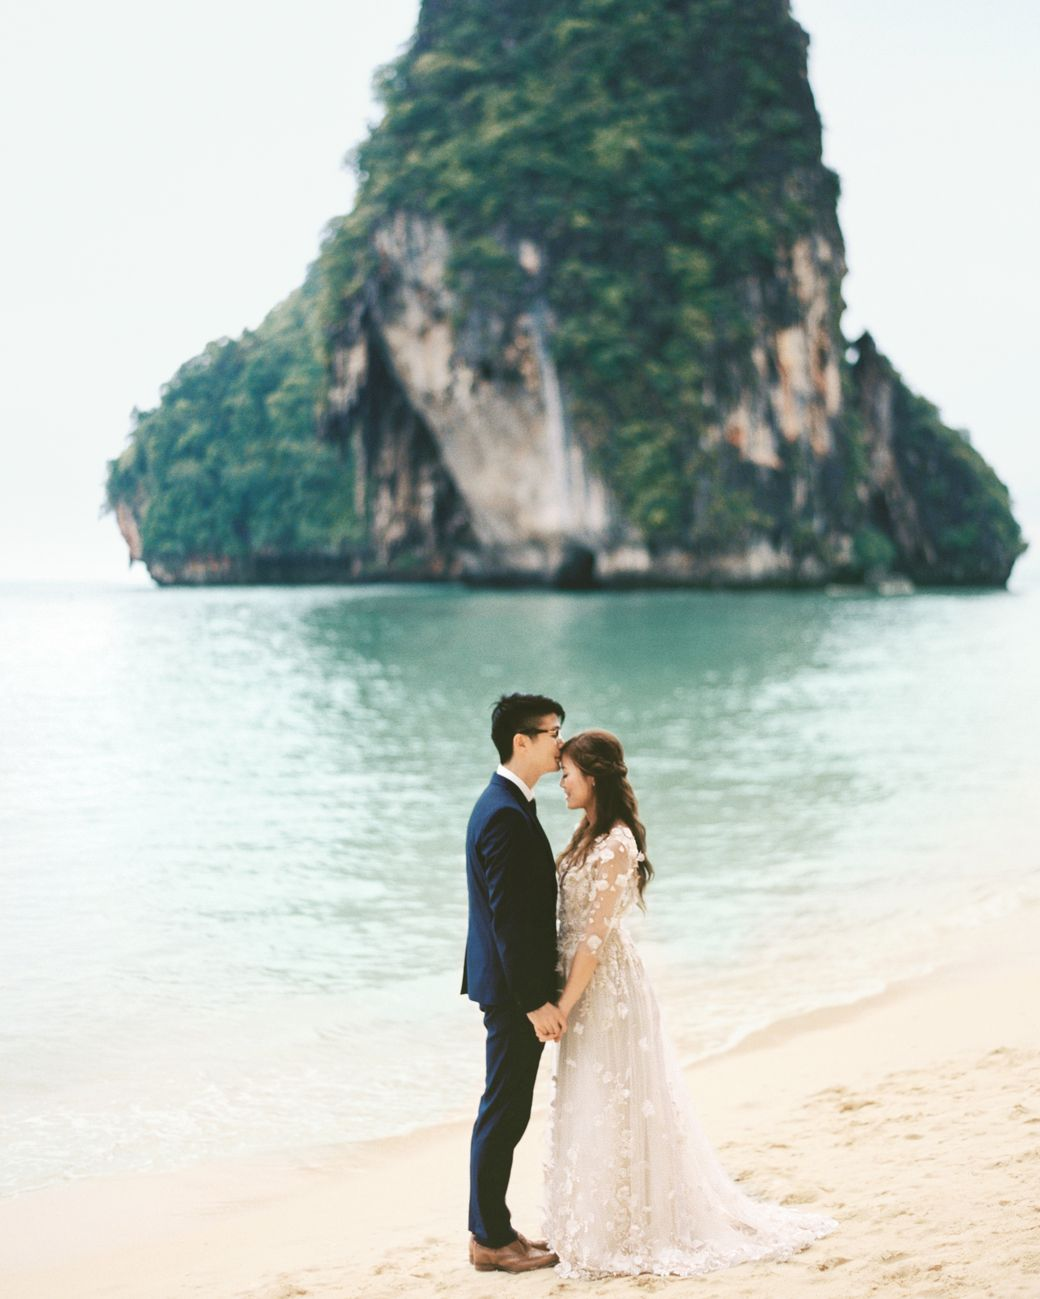 Long Beach Wedding Ceremony Only: 27 Stunning Beach Wedding Dresses